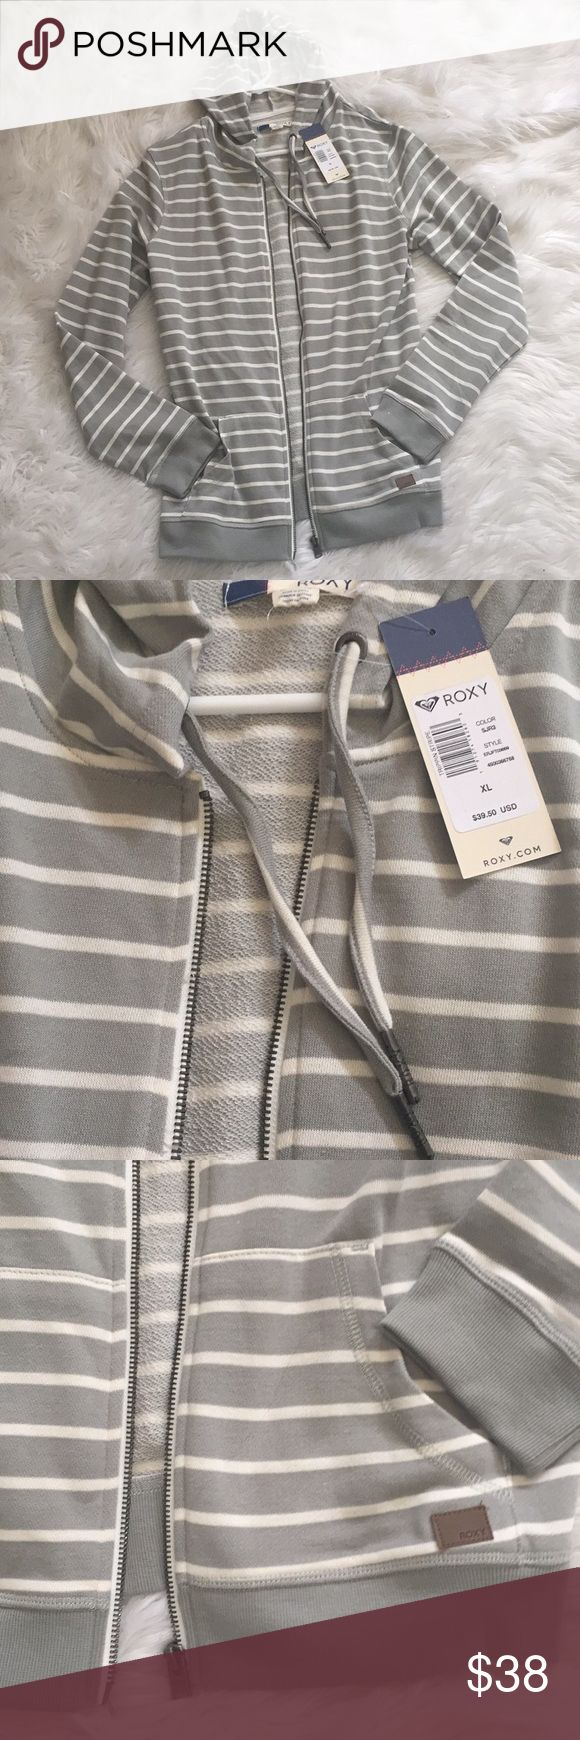 Roxy striped zip up hoodie Roxy striped zip up hoodie Roxy Jackets & Coats